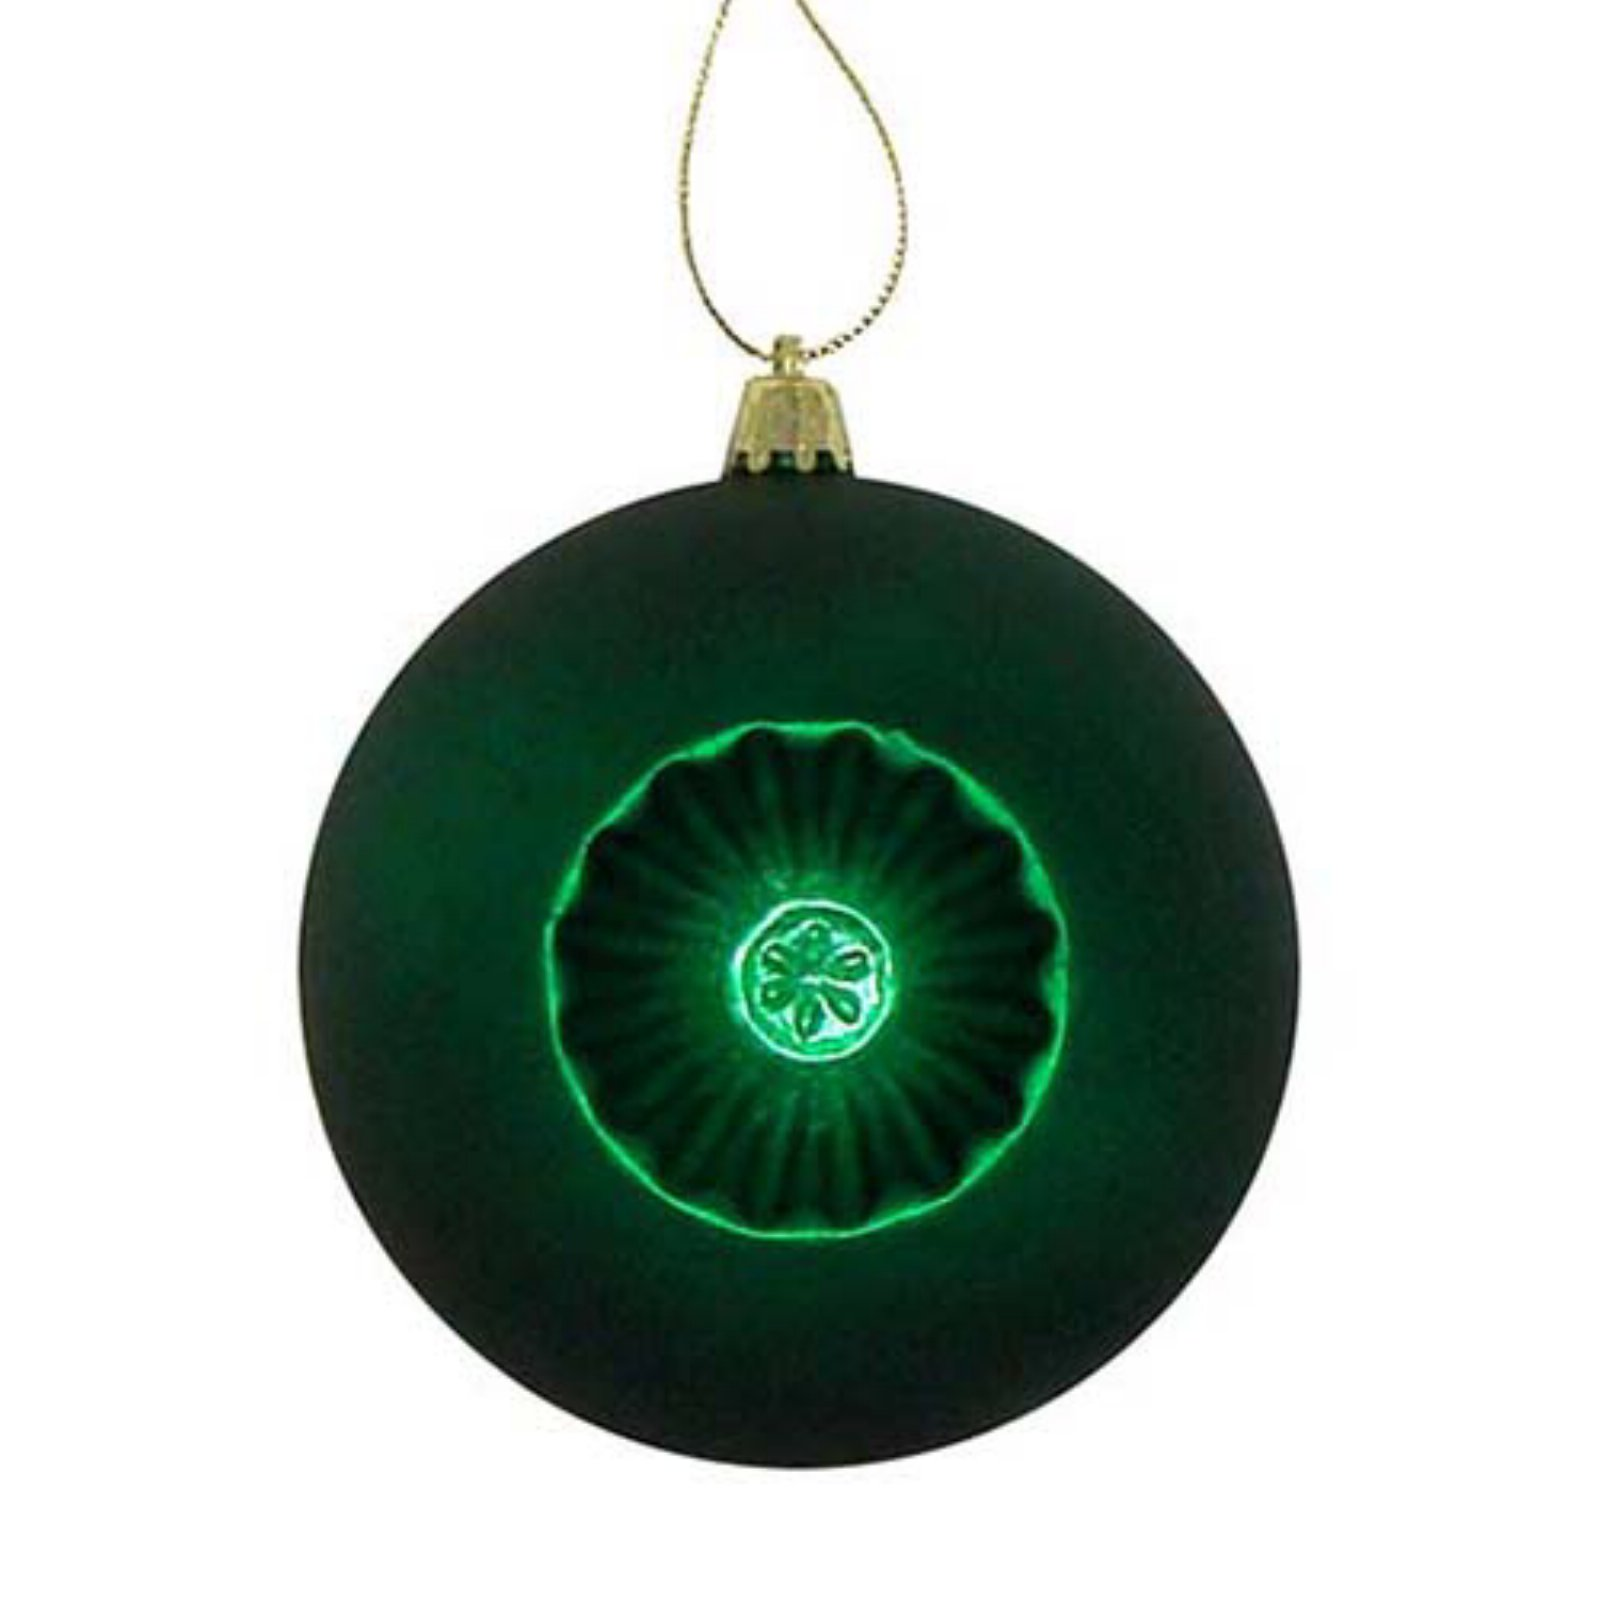 DAK 4 in. Matte Retro Reflector Shatterproof Christmas Ball Ornaments - Set of 6 Christmas Green ...